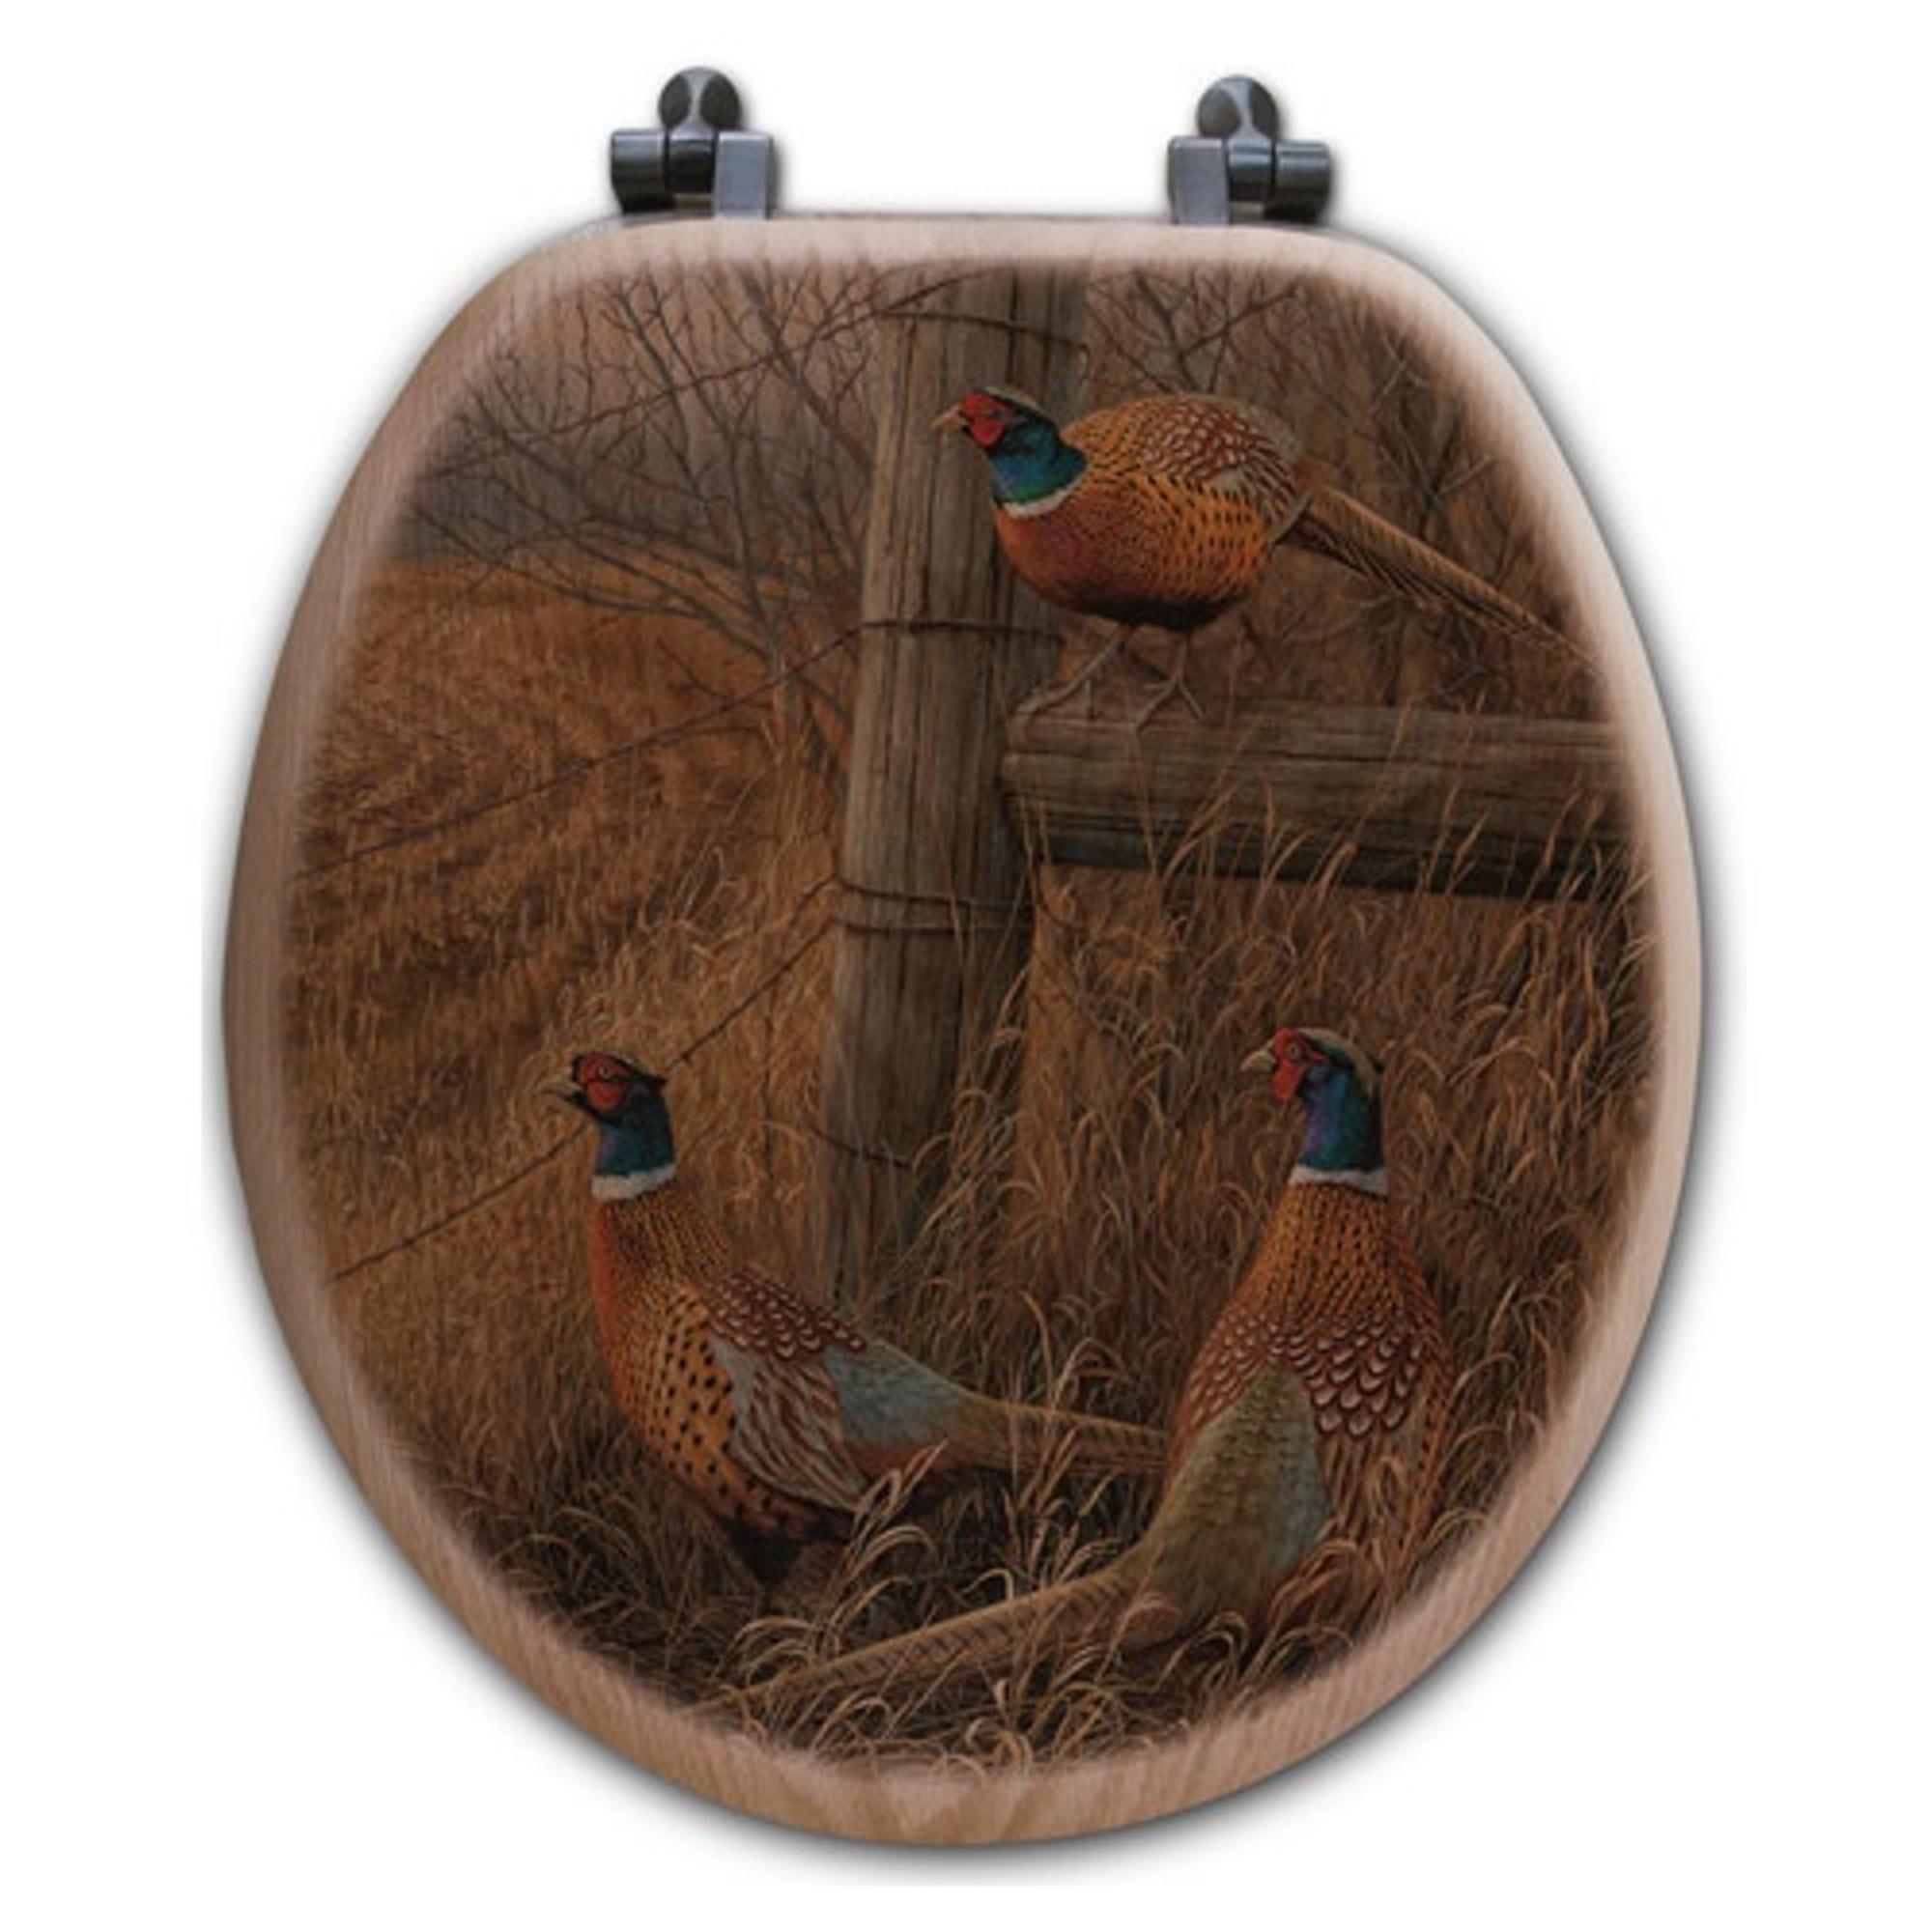 Sensational Pheasant Oak Wood Round Toilet Seat Abandoned Fenceline Forskolin Free Trial Chair Design Images Forskolin Free Trialorg